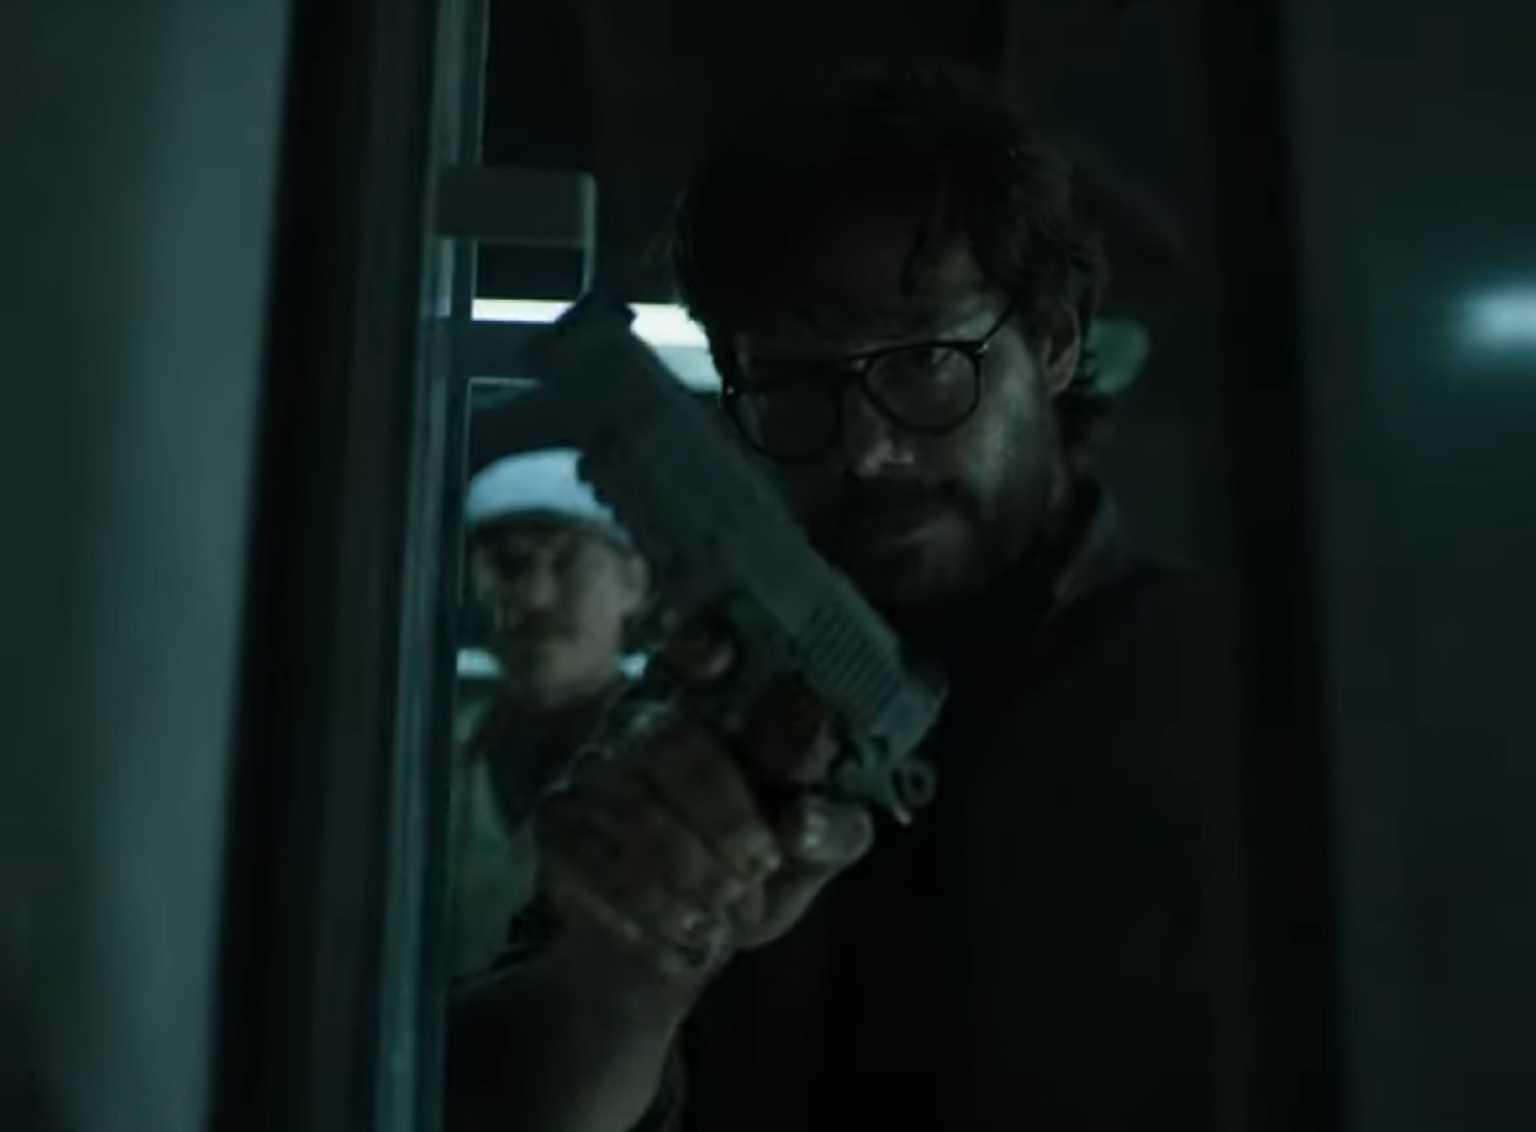 La Casa De Papel: Κυκλοφόρησε το trailer για το μεγάλο φινάλε της σειράς